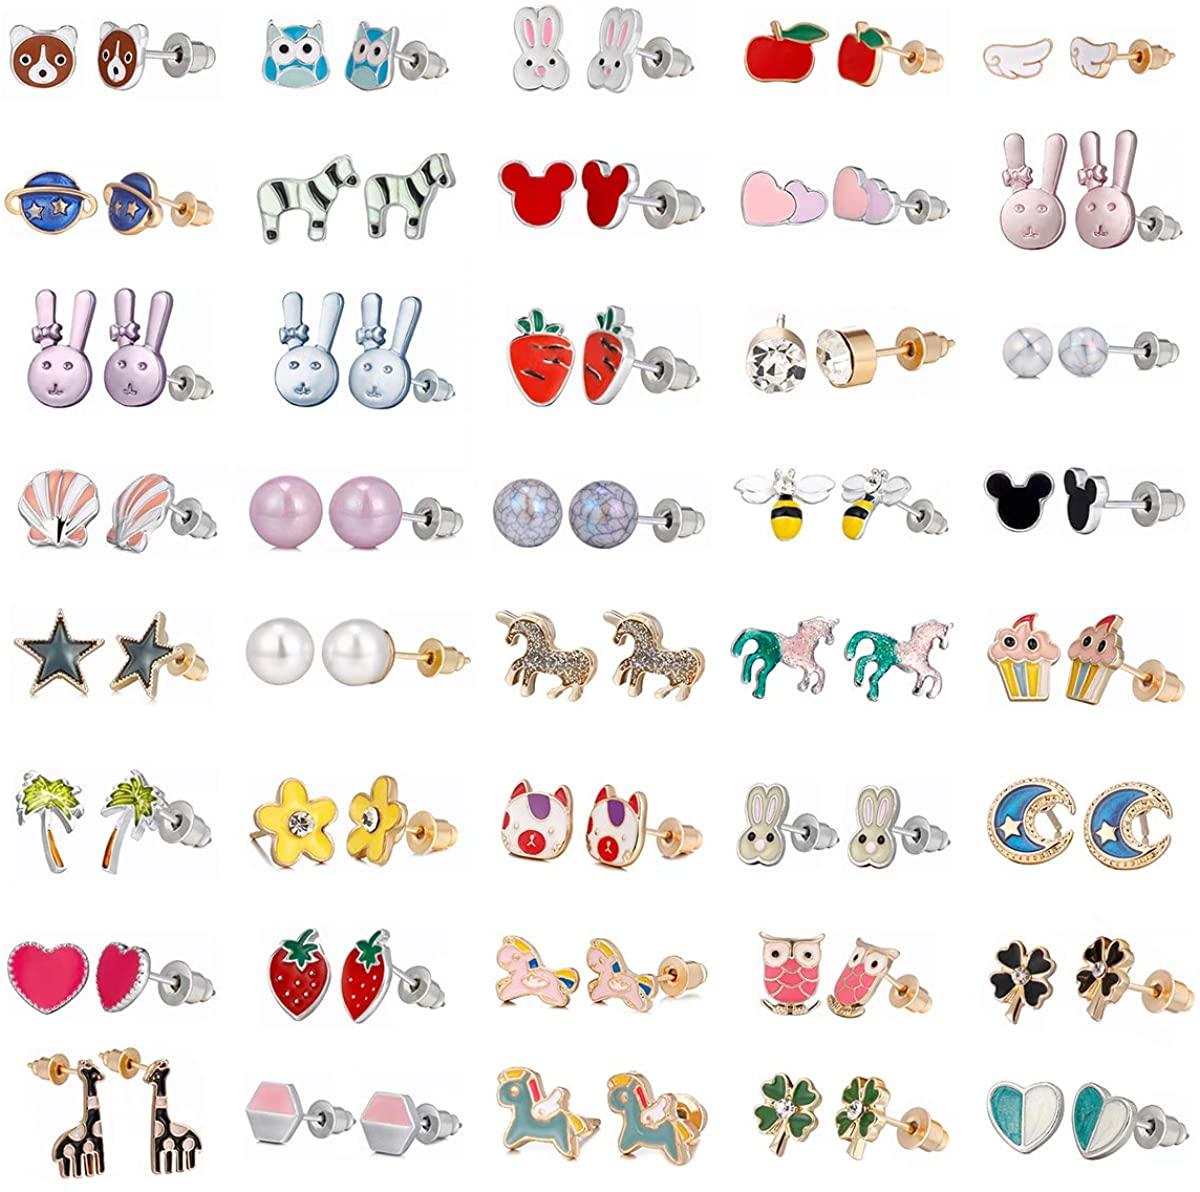 40 Pairs Little Girls Earrings Set Hypoallergenic Stud Earrings Jewelry for Teens Girls